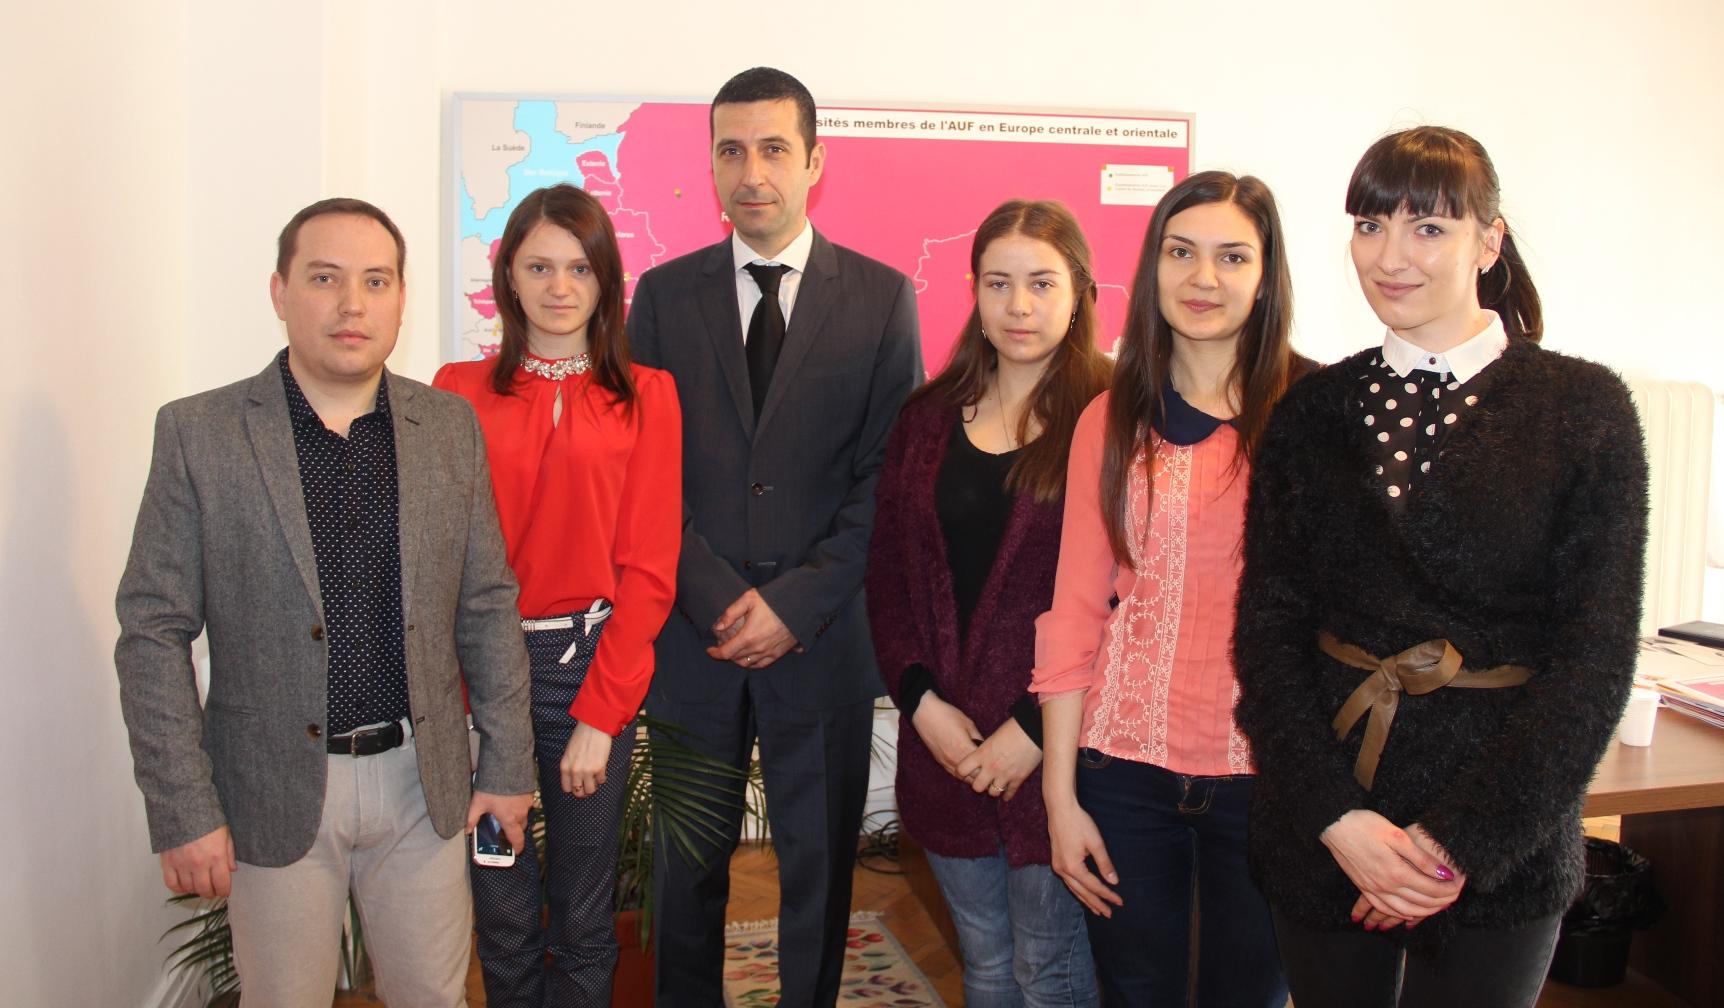 Visite au Bureau Europe centrale et orientale de l'AUF